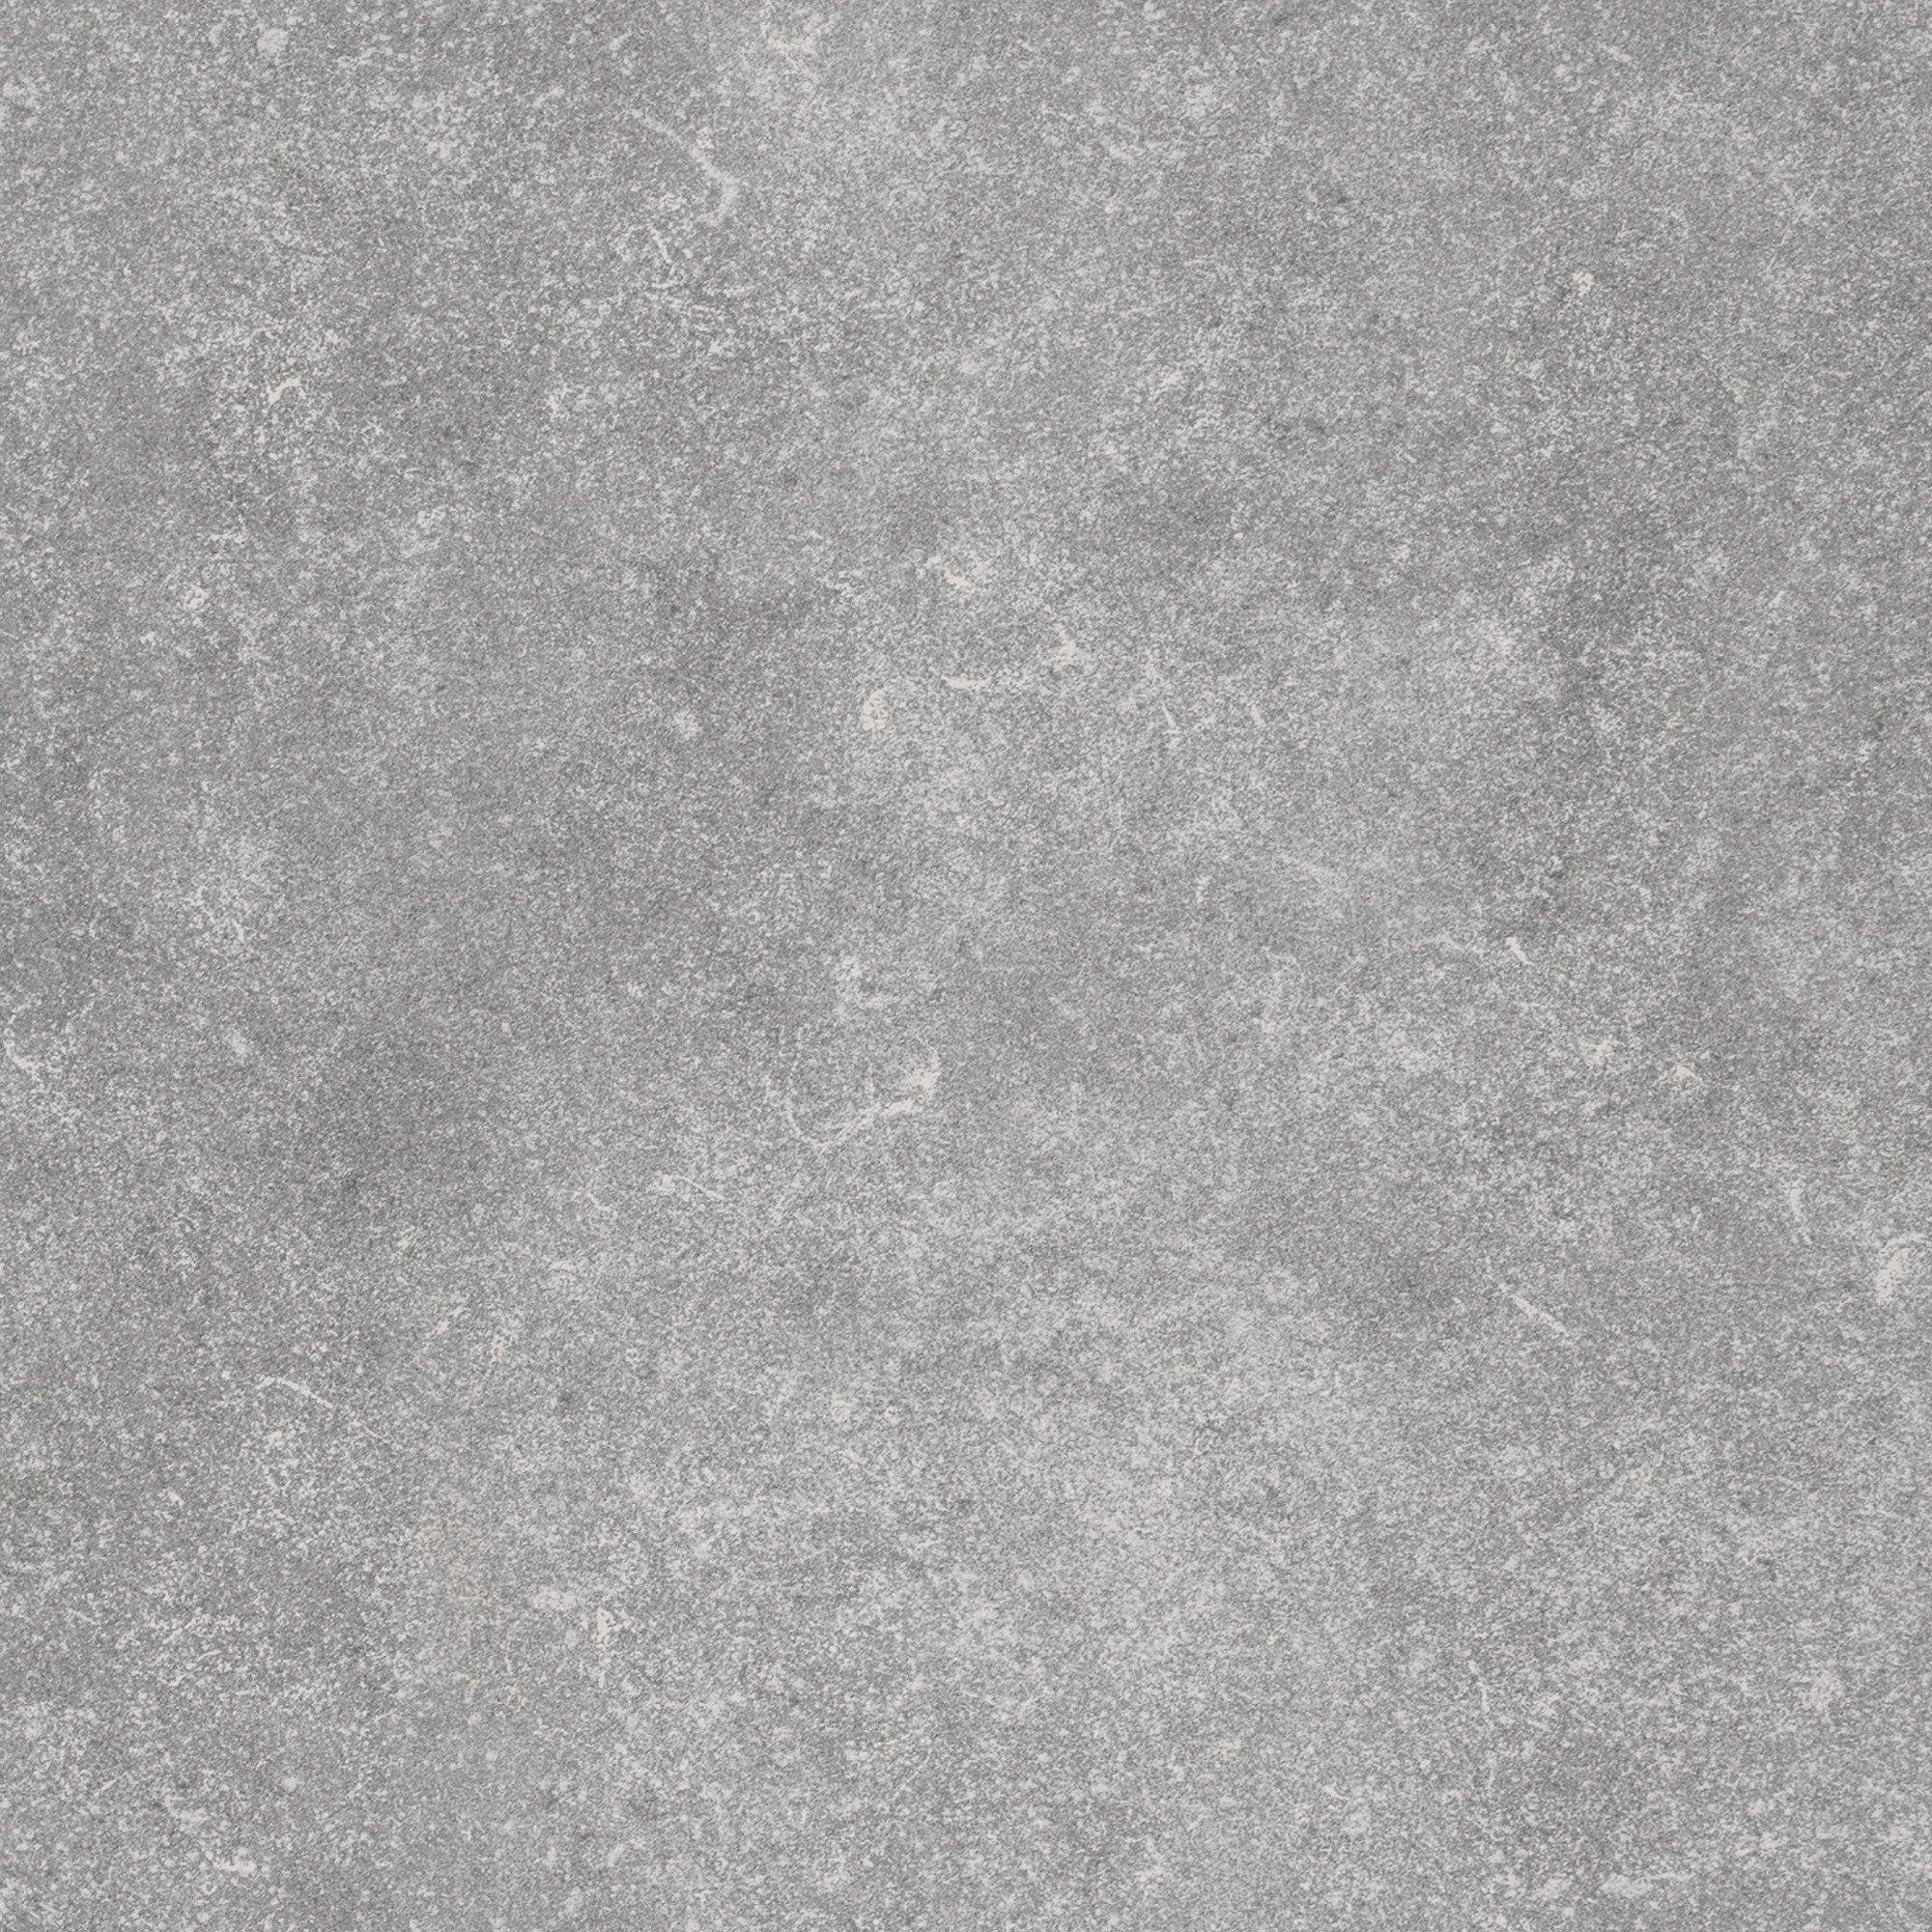 Origin Sand Stone Effect Linear Travertine Ceramic Wall: WALL/FLOOR TILES WITH GRANITE EFFECT BLUESTONE BUXY